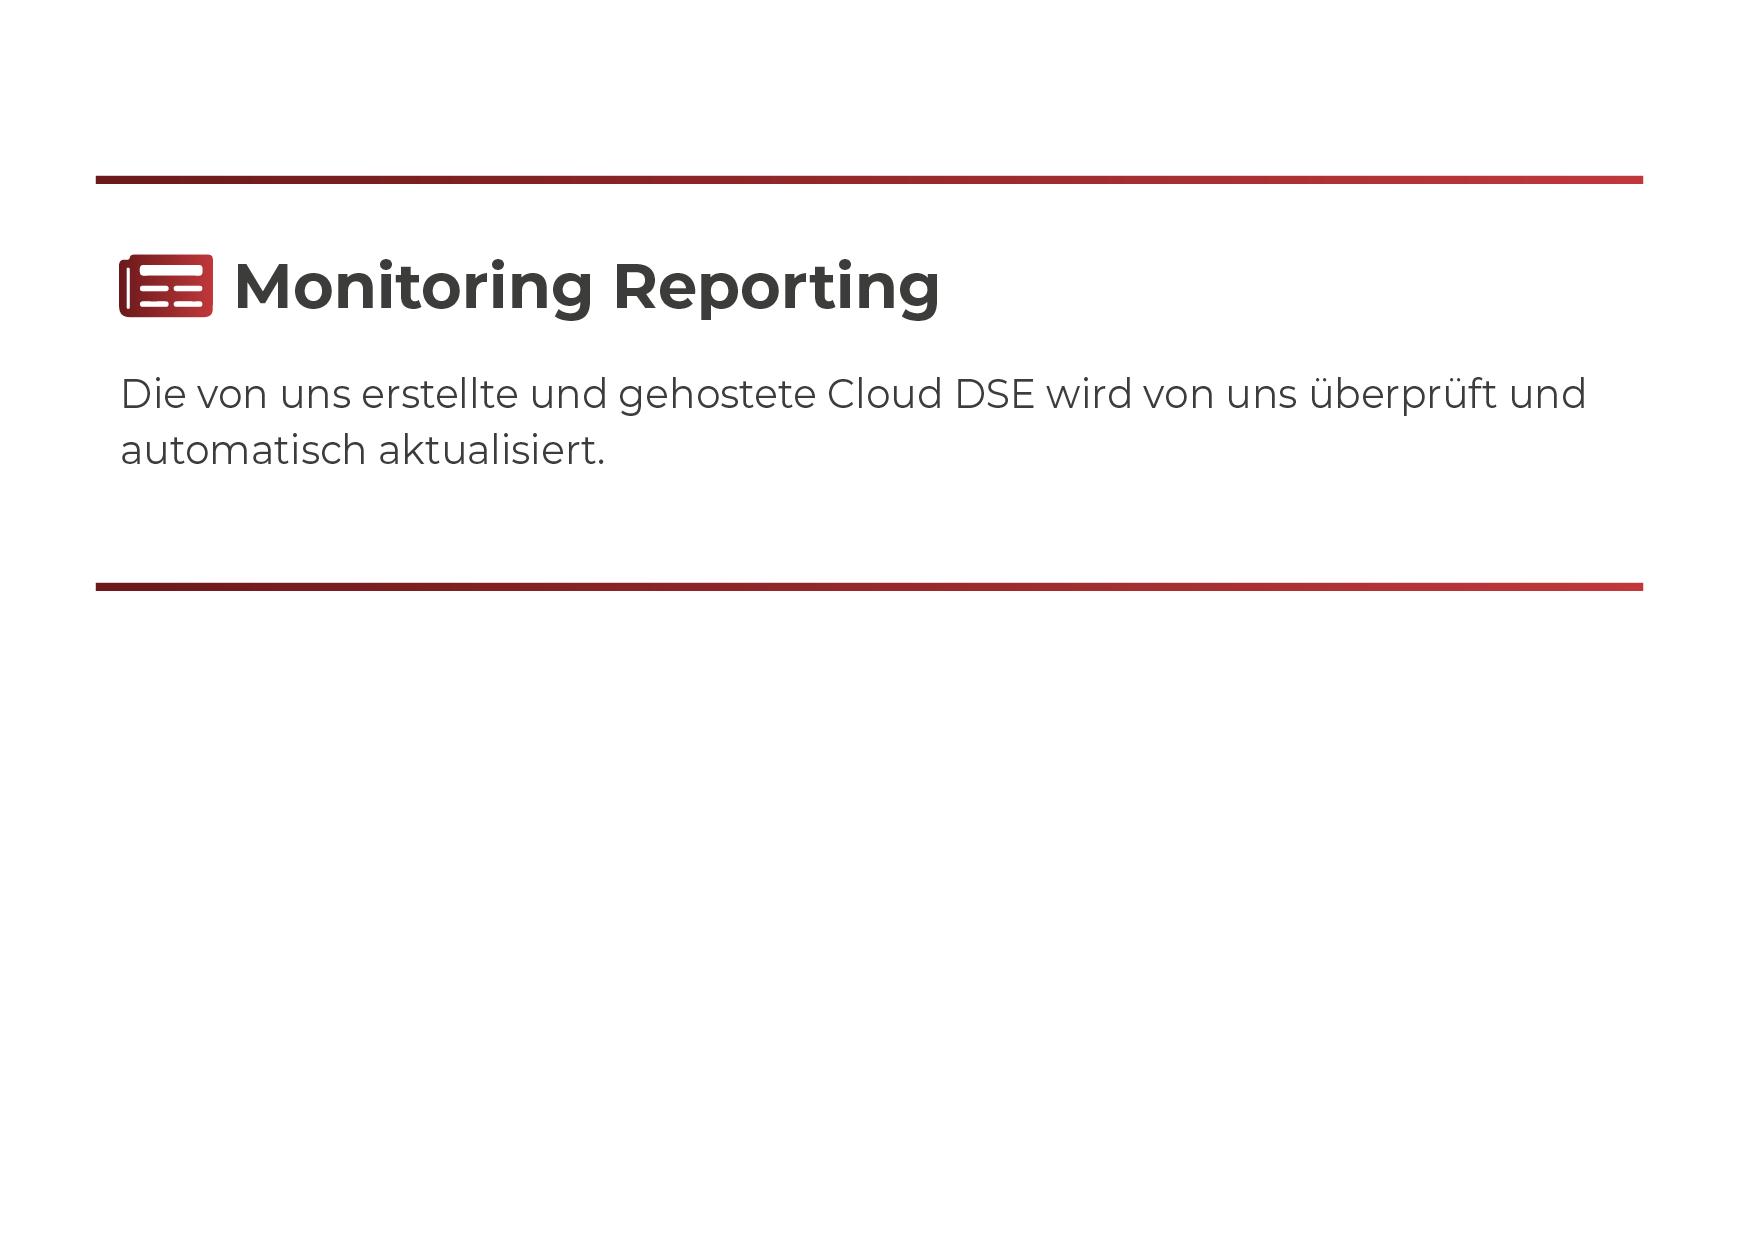 S_Monitoring